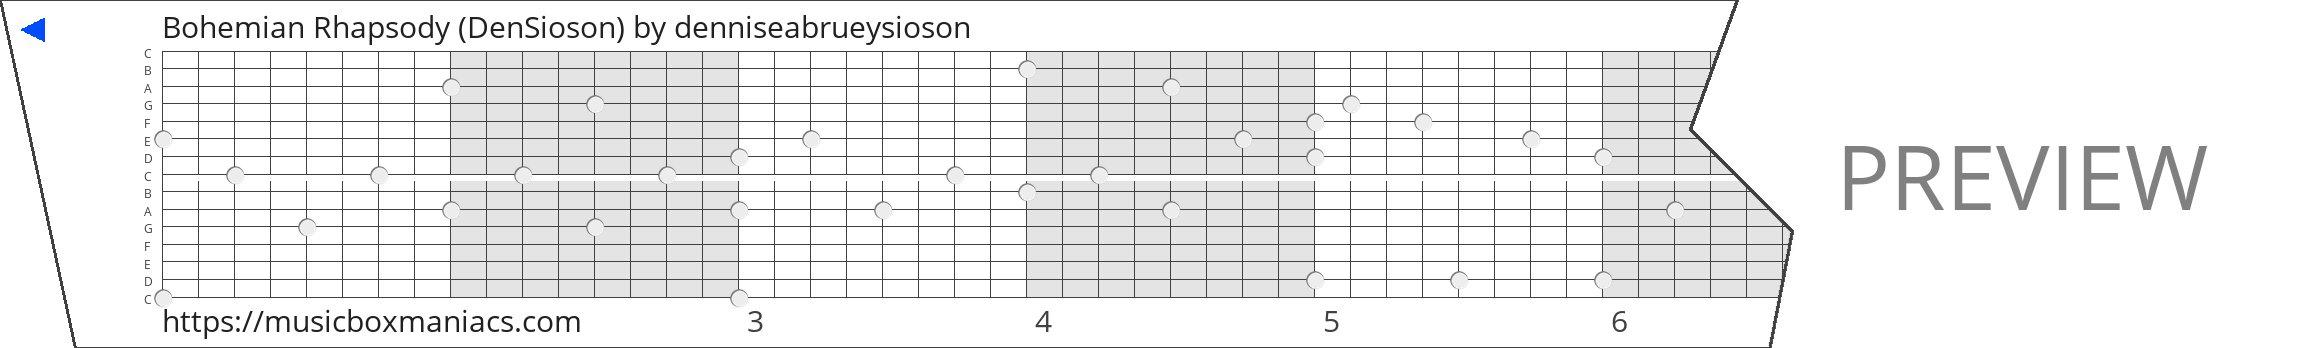 Bohemian Rhapsody (DenSioson) 15 note music box paper strip